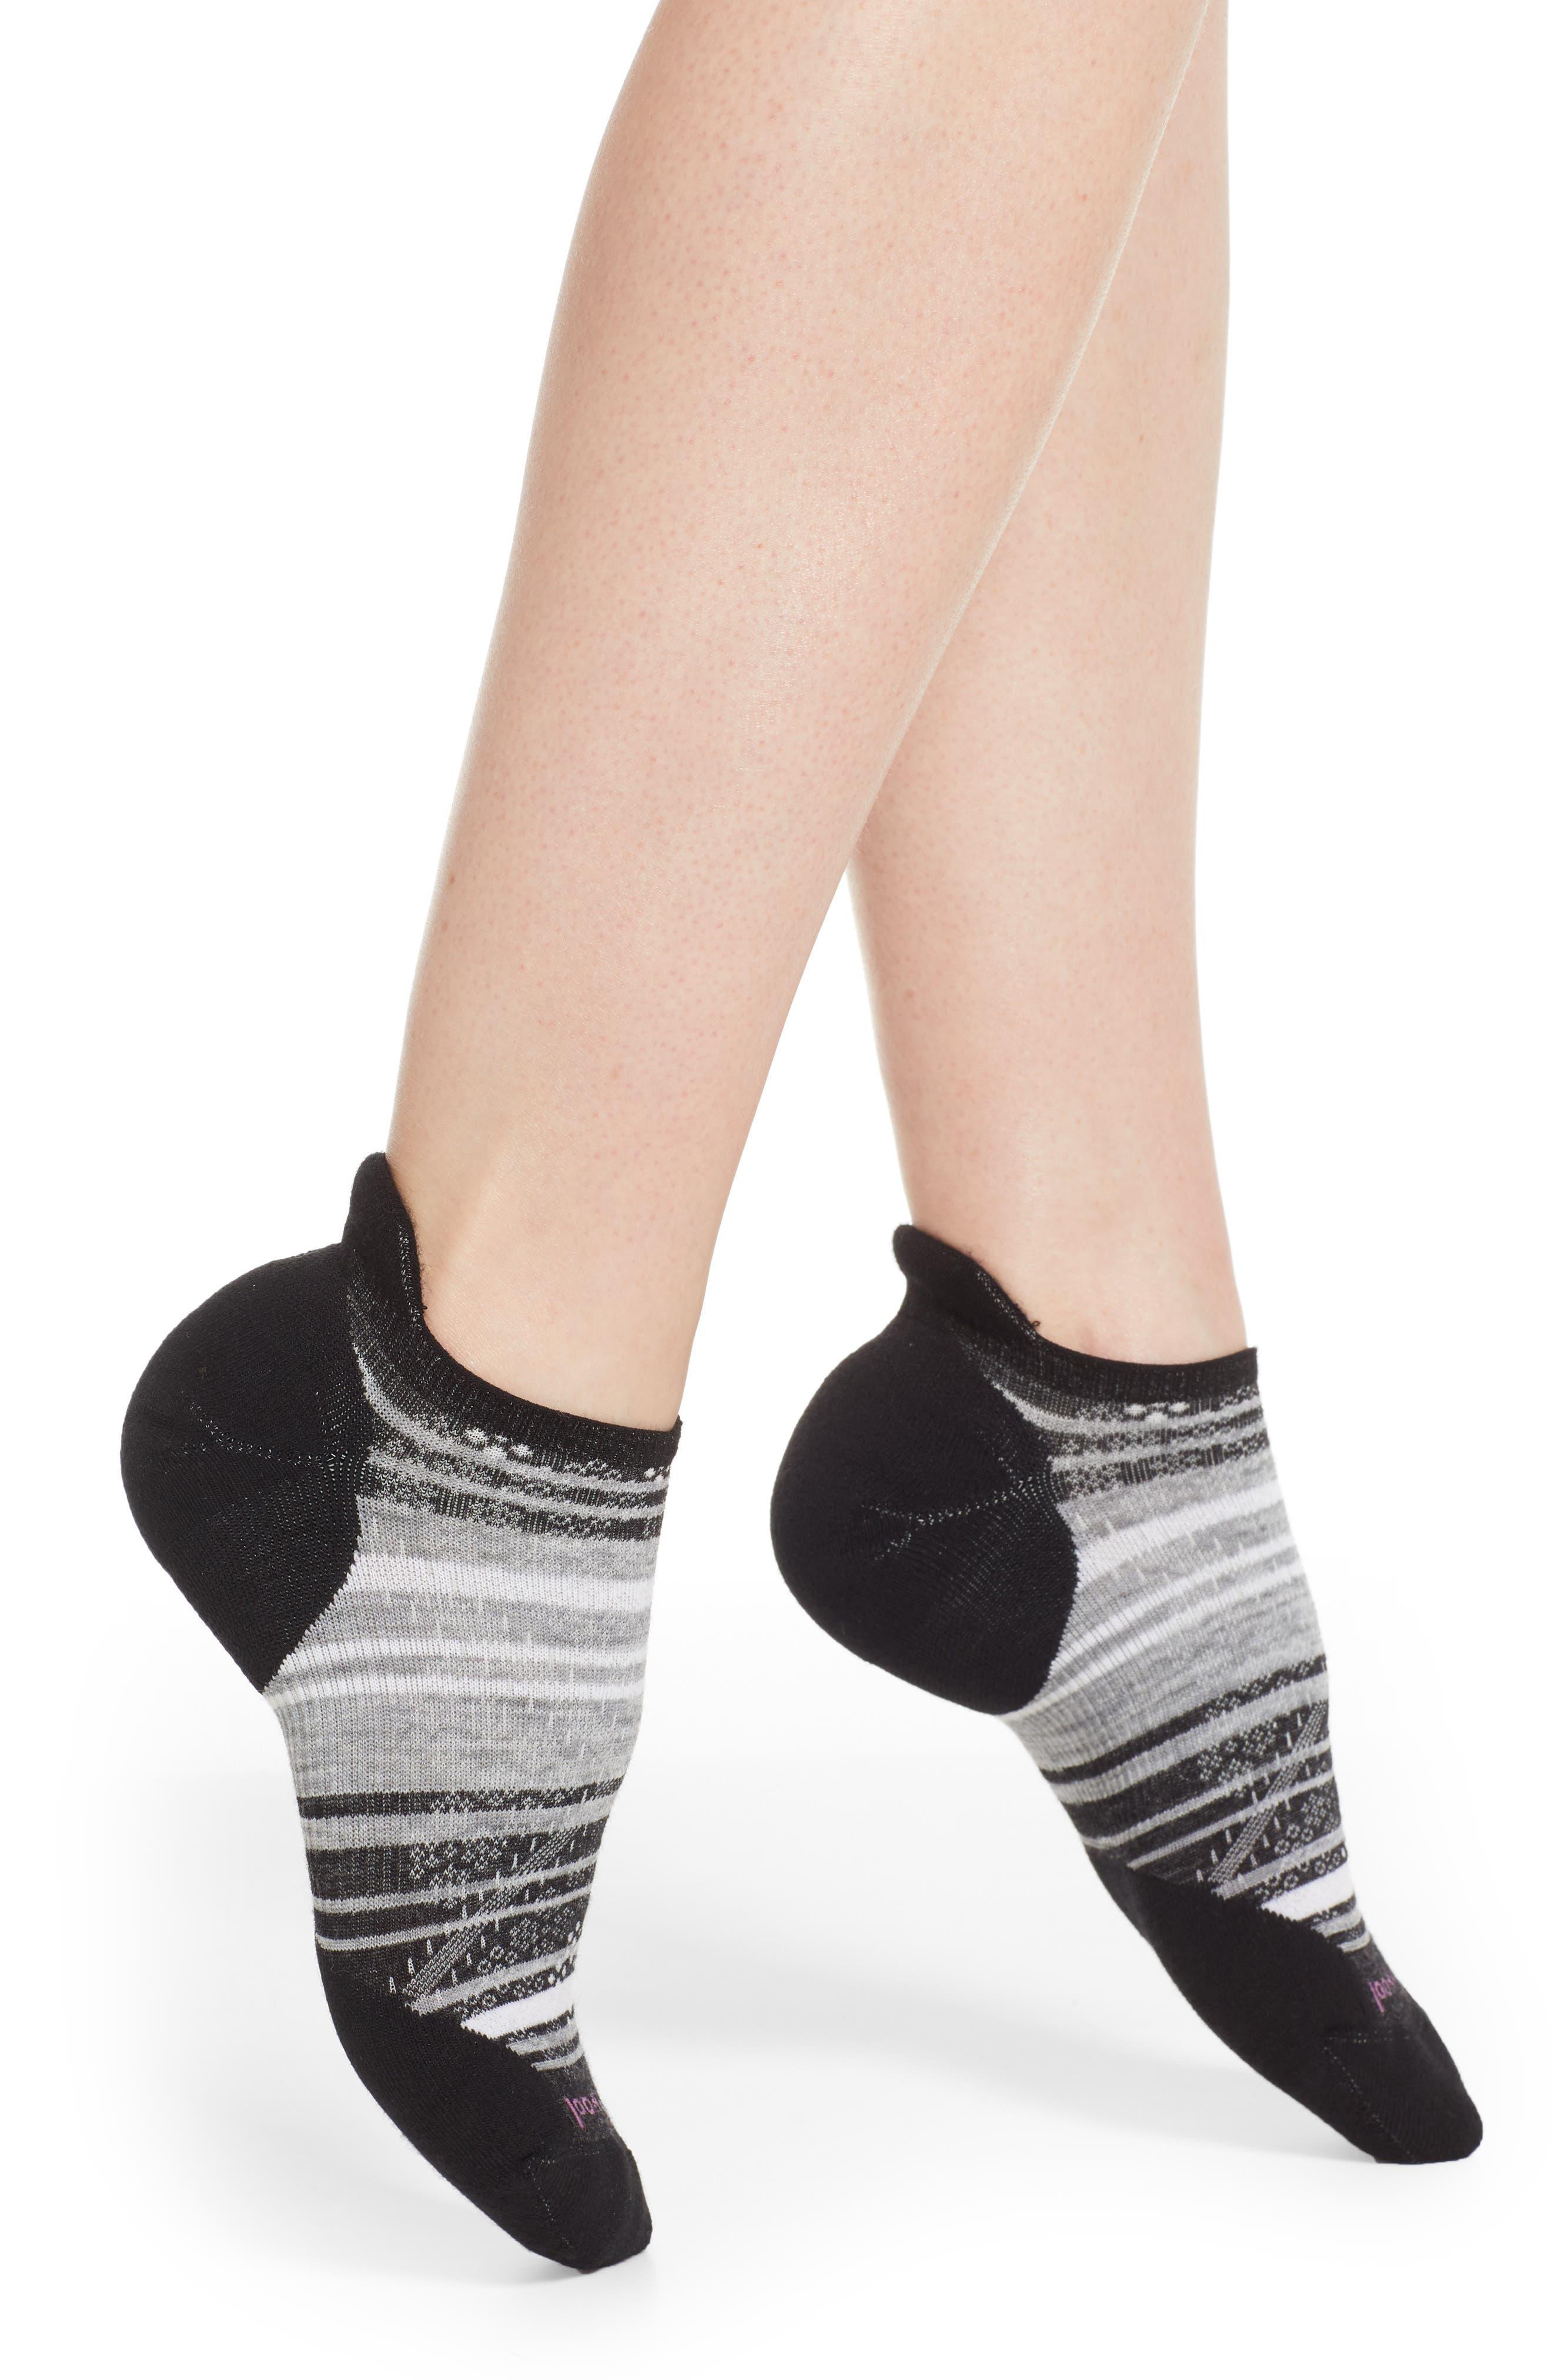 PhD<sup>®</sup> Run Light Elite Socks,                             Main thumbnail 1, color,                             BLACK/ LIGHT GRAY